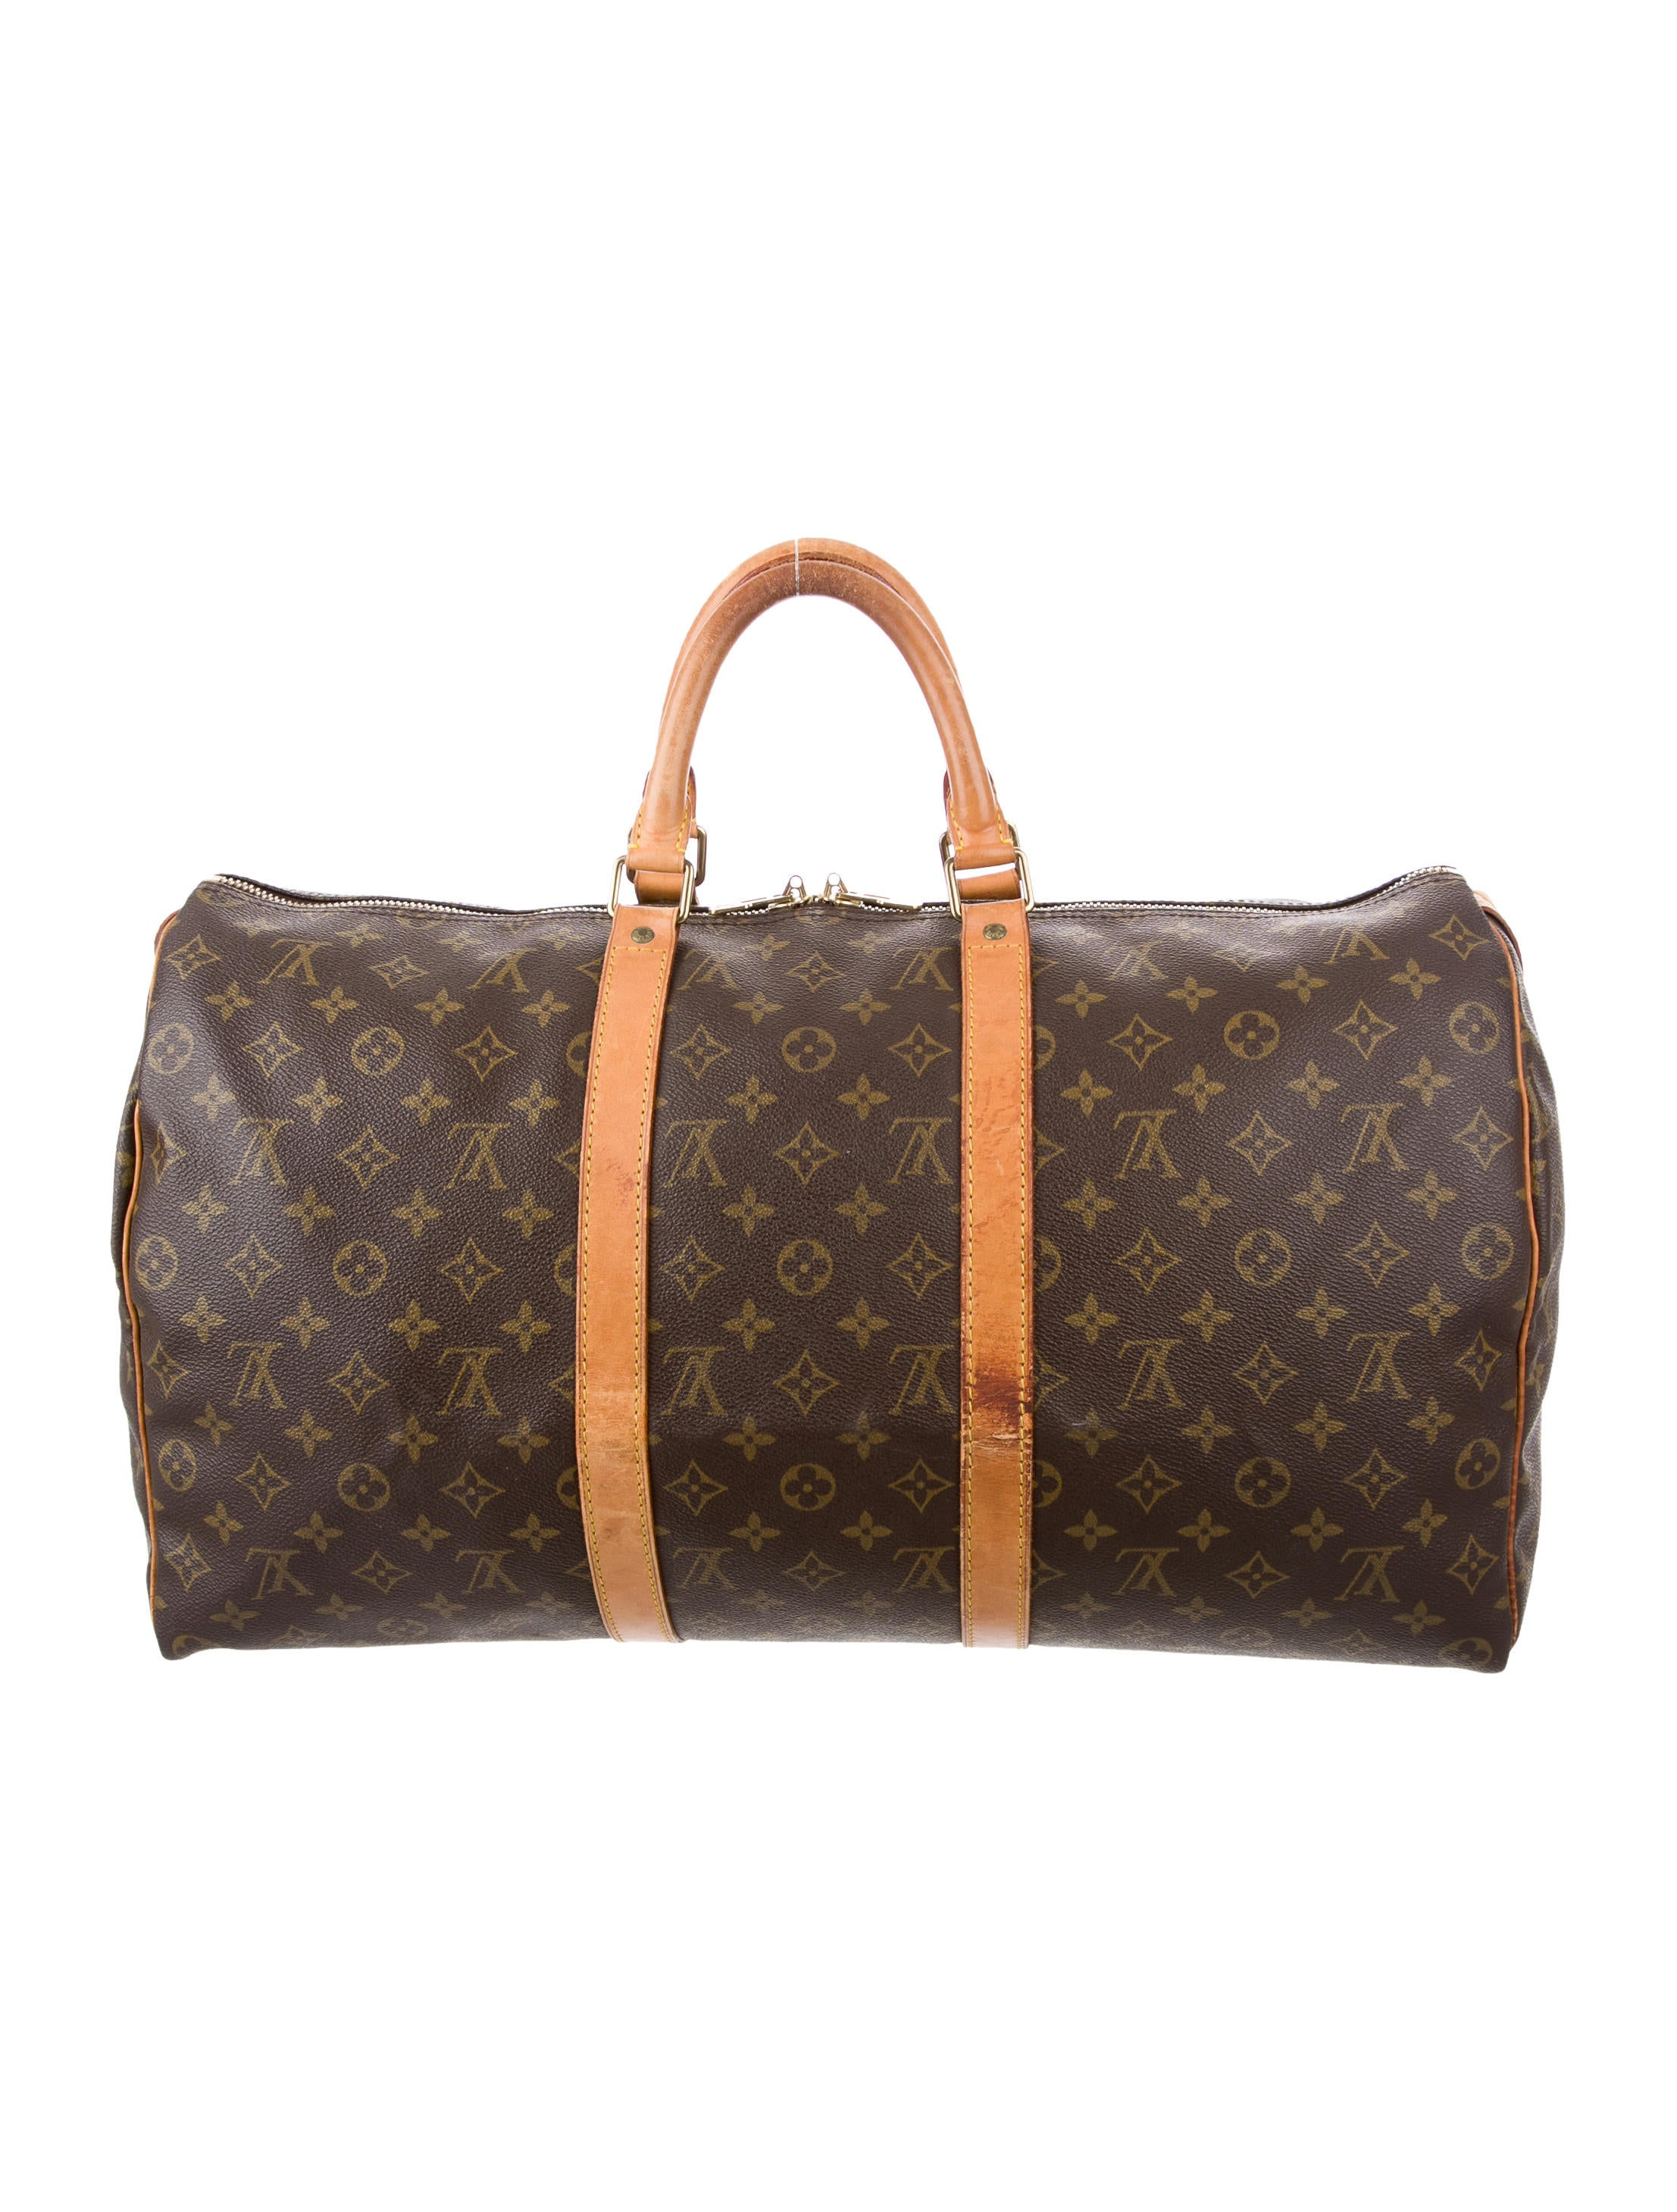 louis vuitton monogram keepall 50 handbags lou123834 the realreal. Black Bedroom Furniture Sets. Home Design Ideas